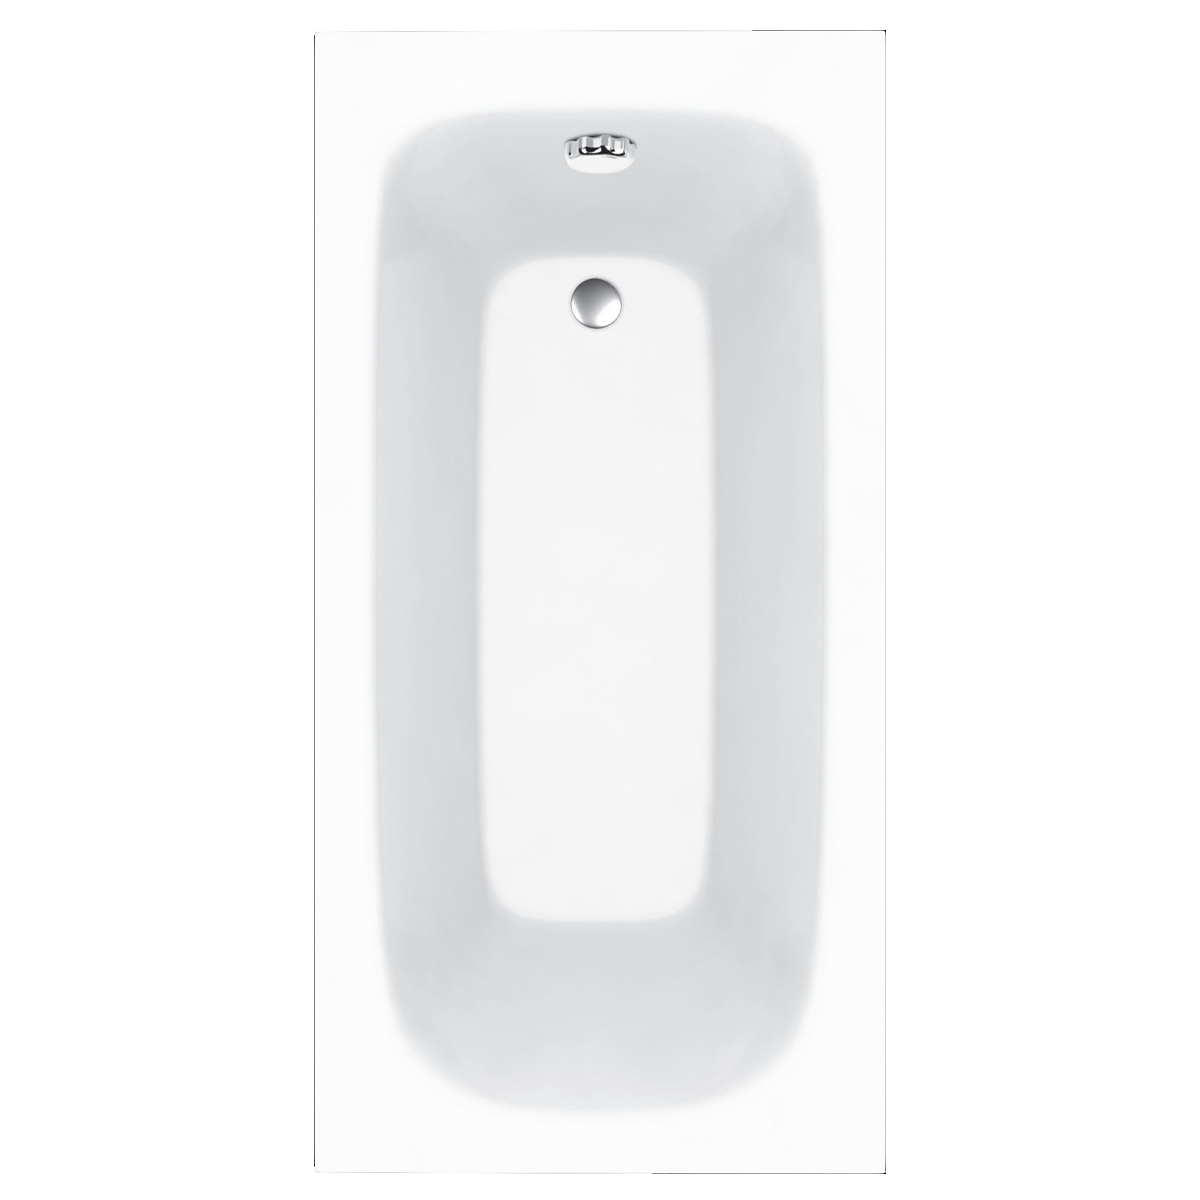 K-Vit G4K 1500 x 700 Contract Bath